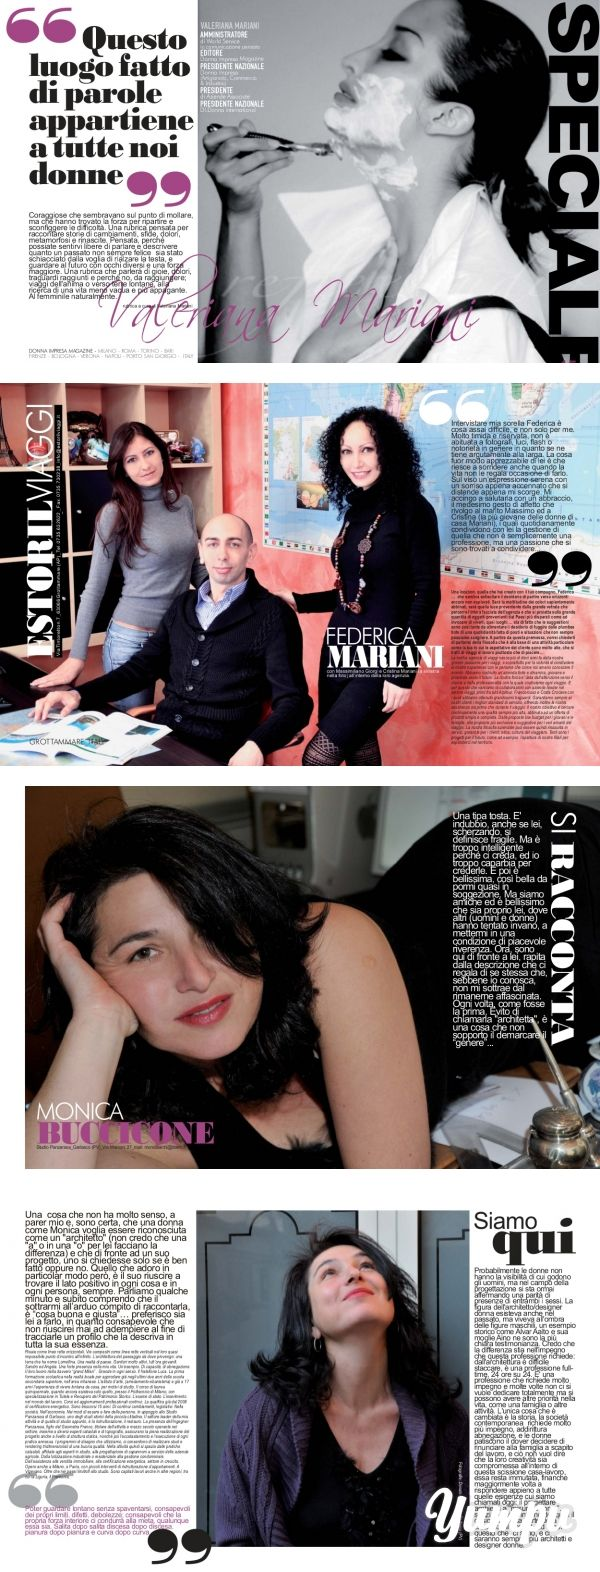 04 SPECIALE DONNA IMPRESA NOV... - Donna Impresa Magazine - Magazine with 7…